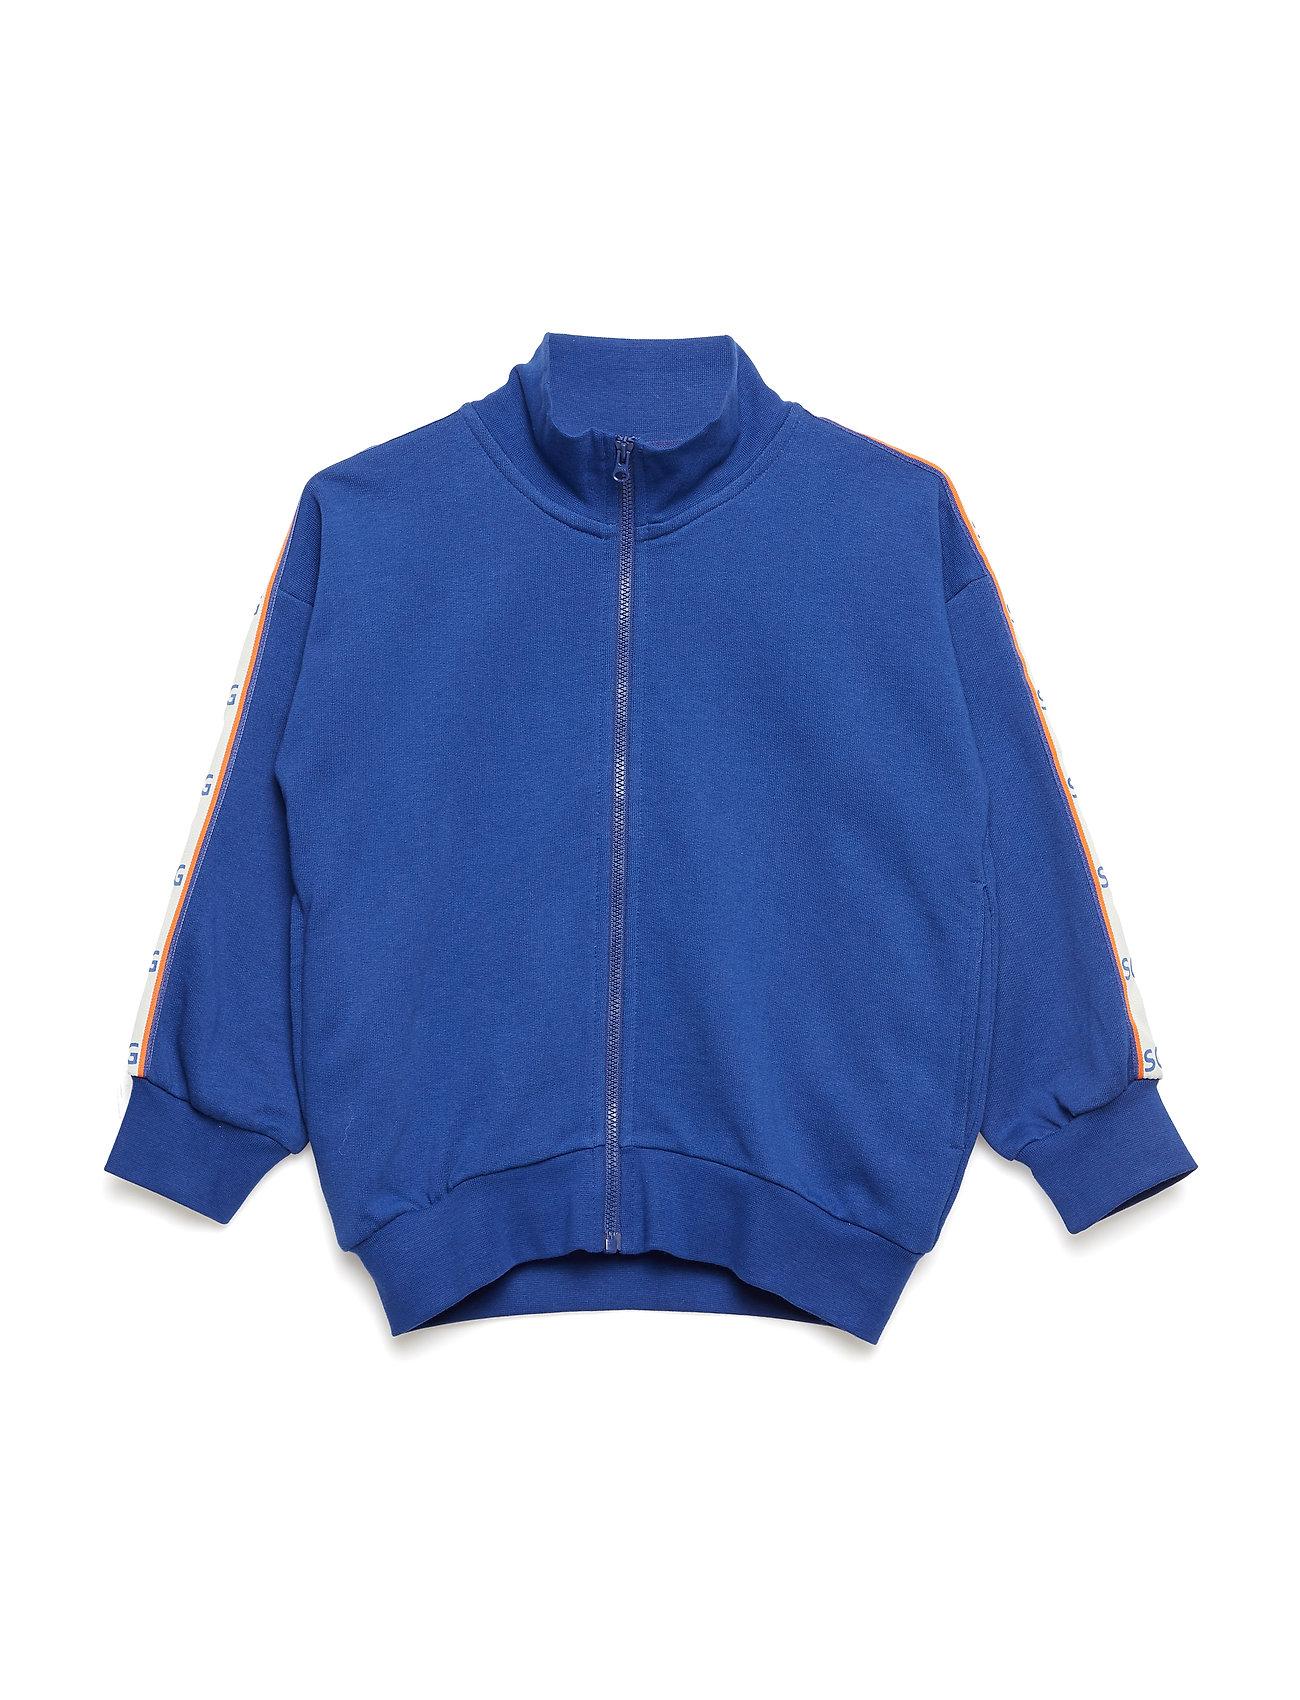 Soft Gallery Dorian Jacket - SODALITE BLUE